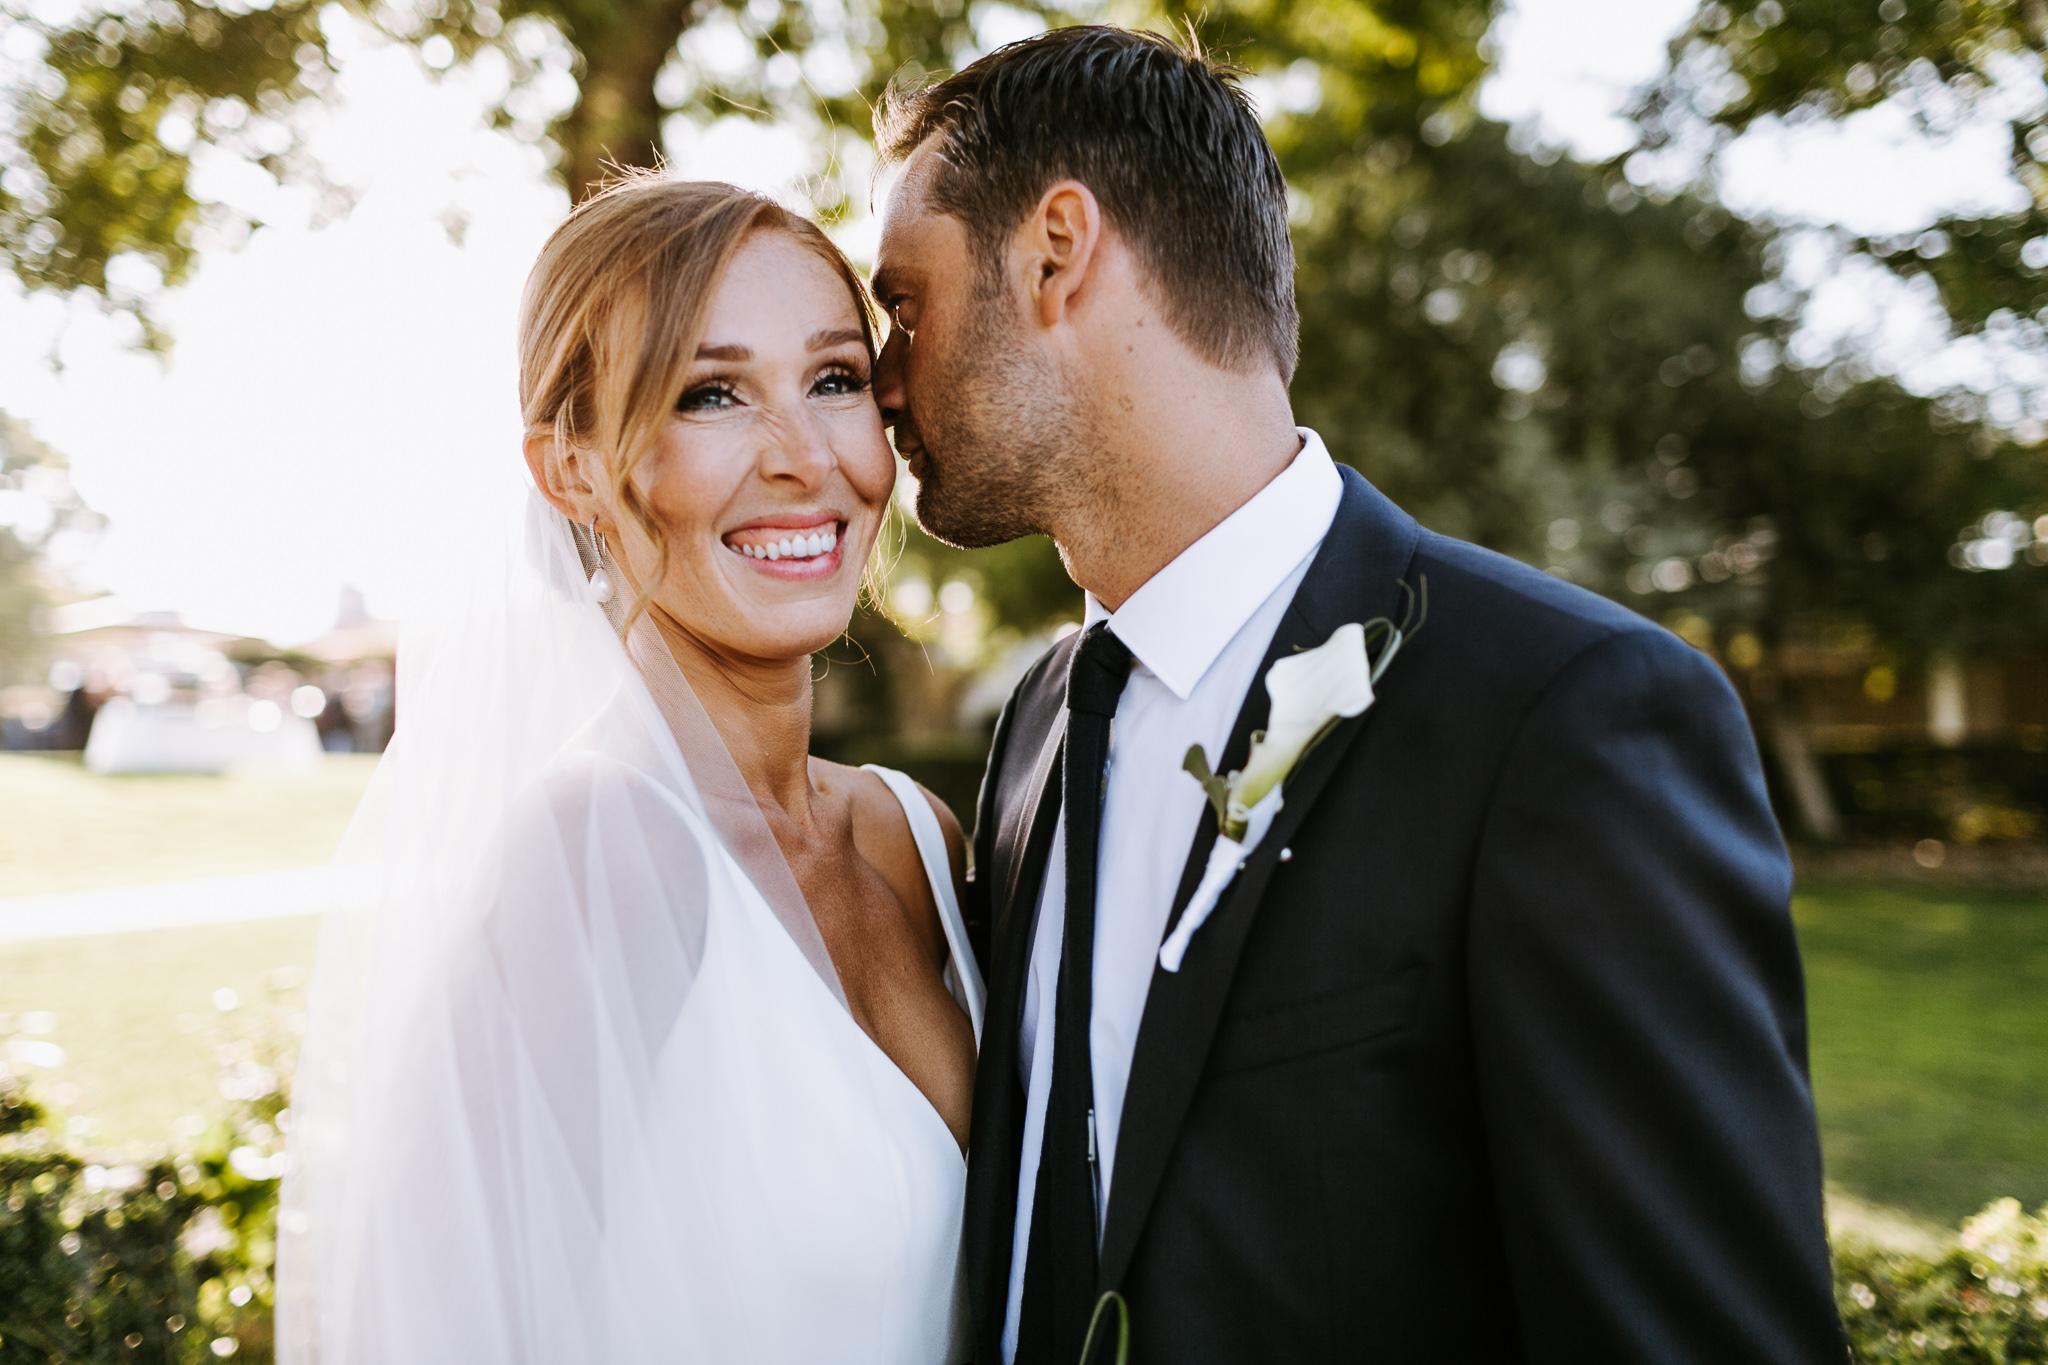 San-Diego-Wedding-Photographer-26.jpg